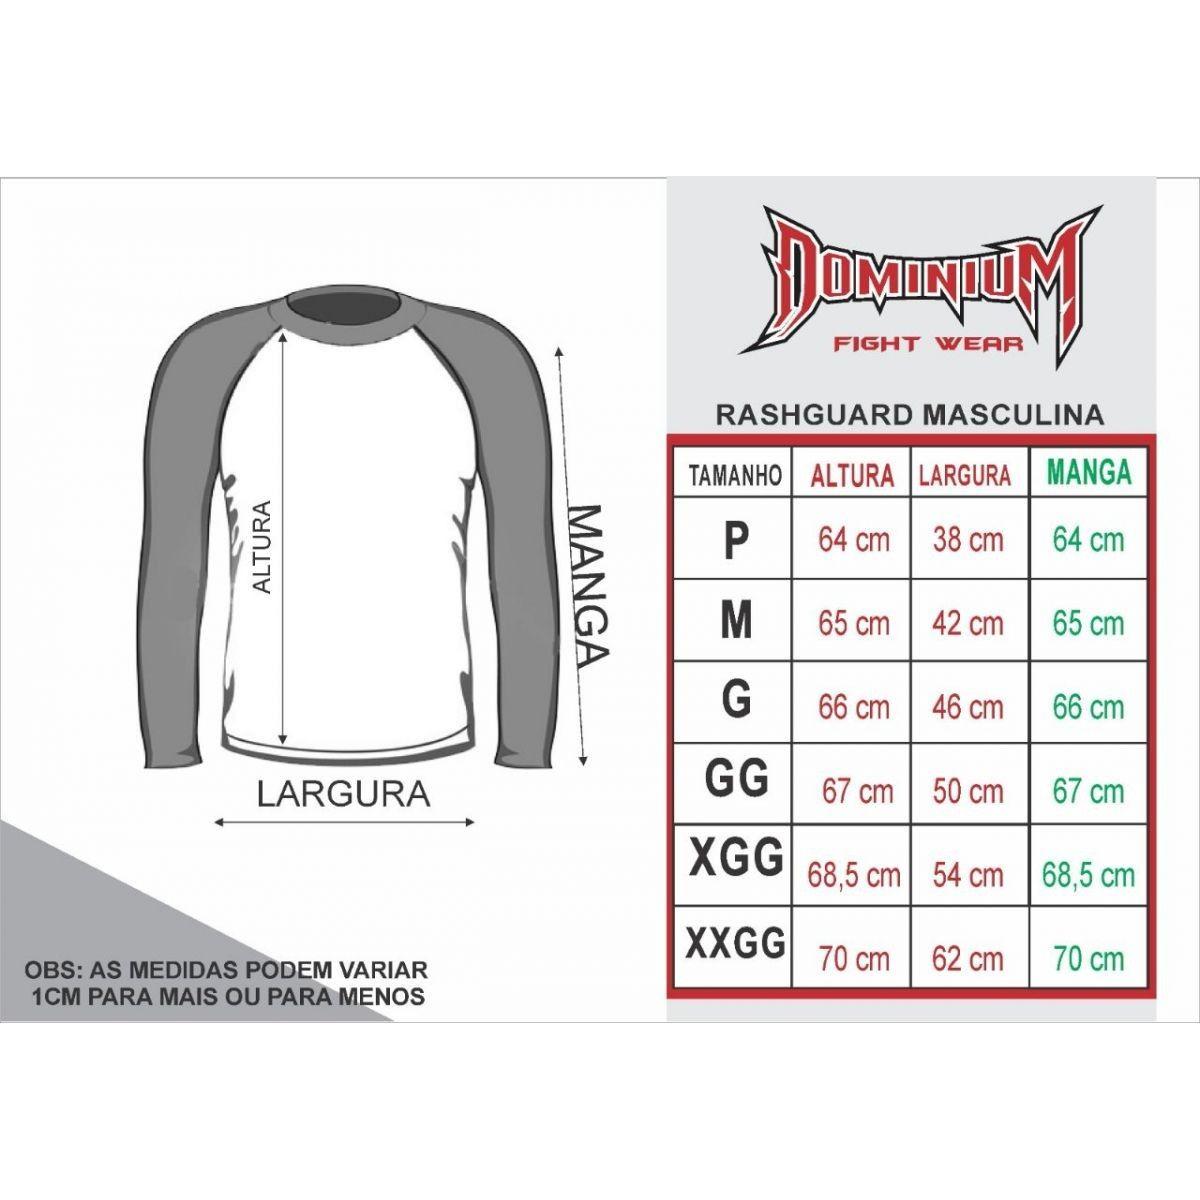 Camisa Rash Guard - Manga Longa - Roxa - 2737 - Dominium -  - Loja do Competidor